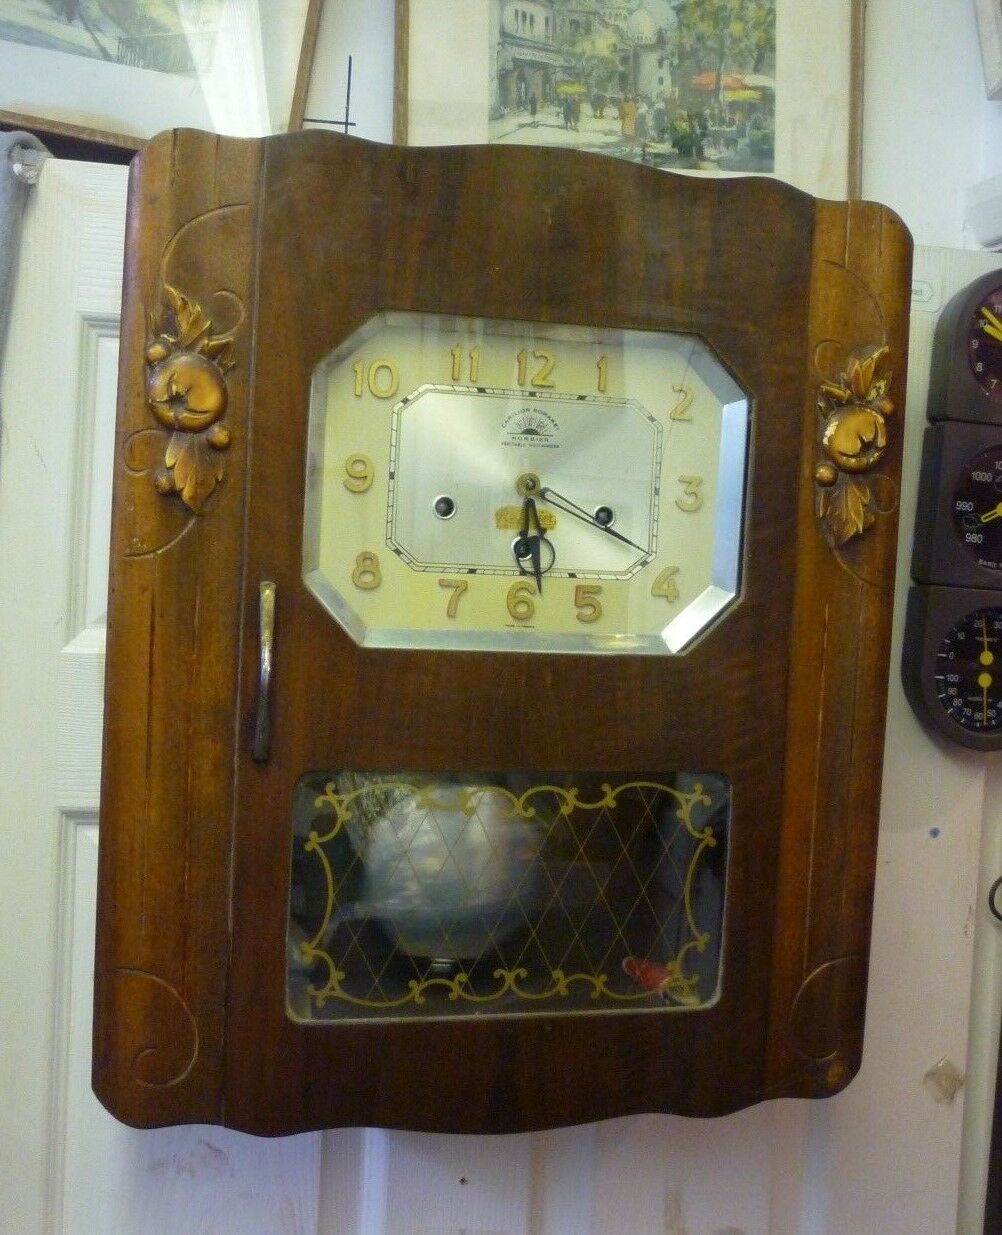 Original Art Deco Morbier Westminster Chime Wall Clock Full Working Order